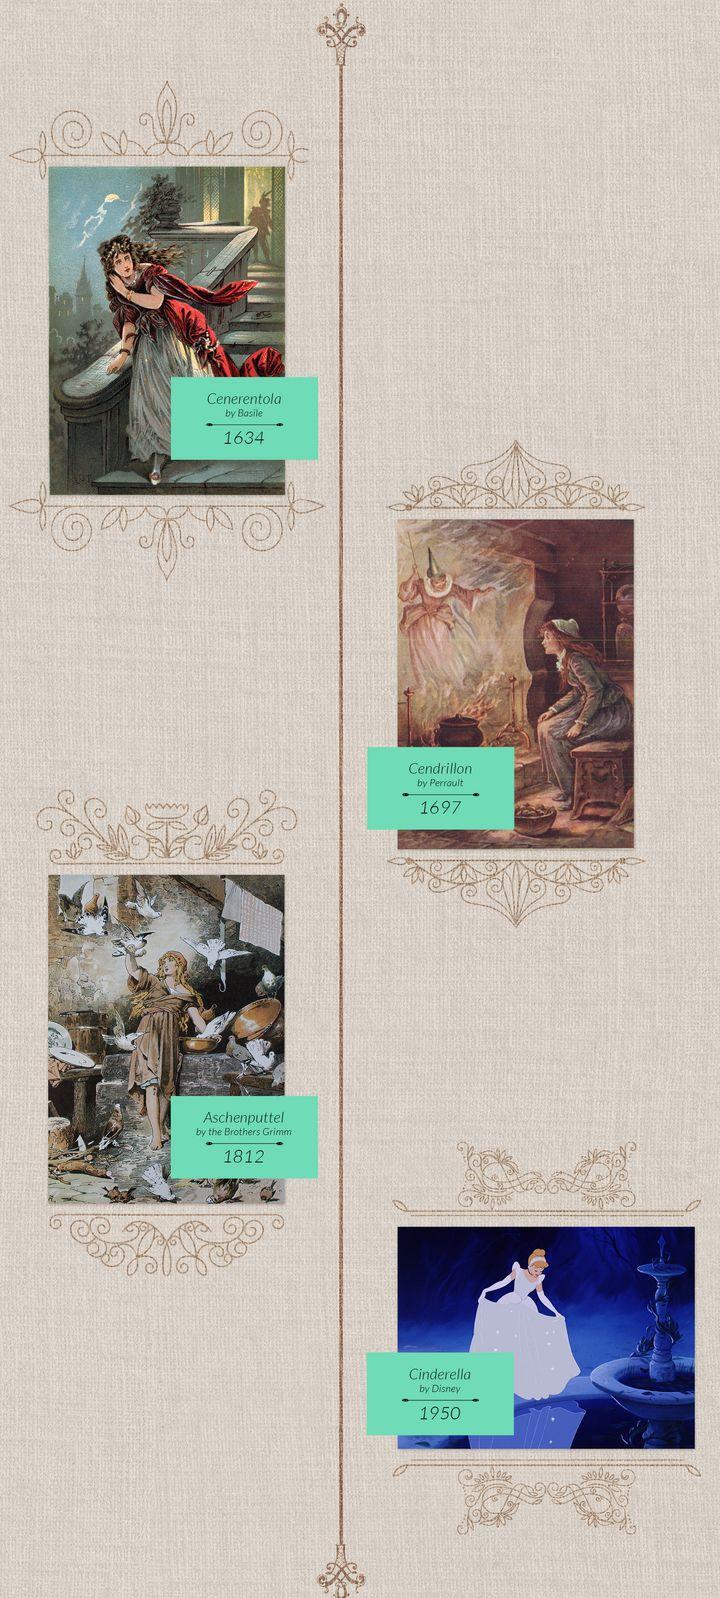 Various versions of Cinderella.